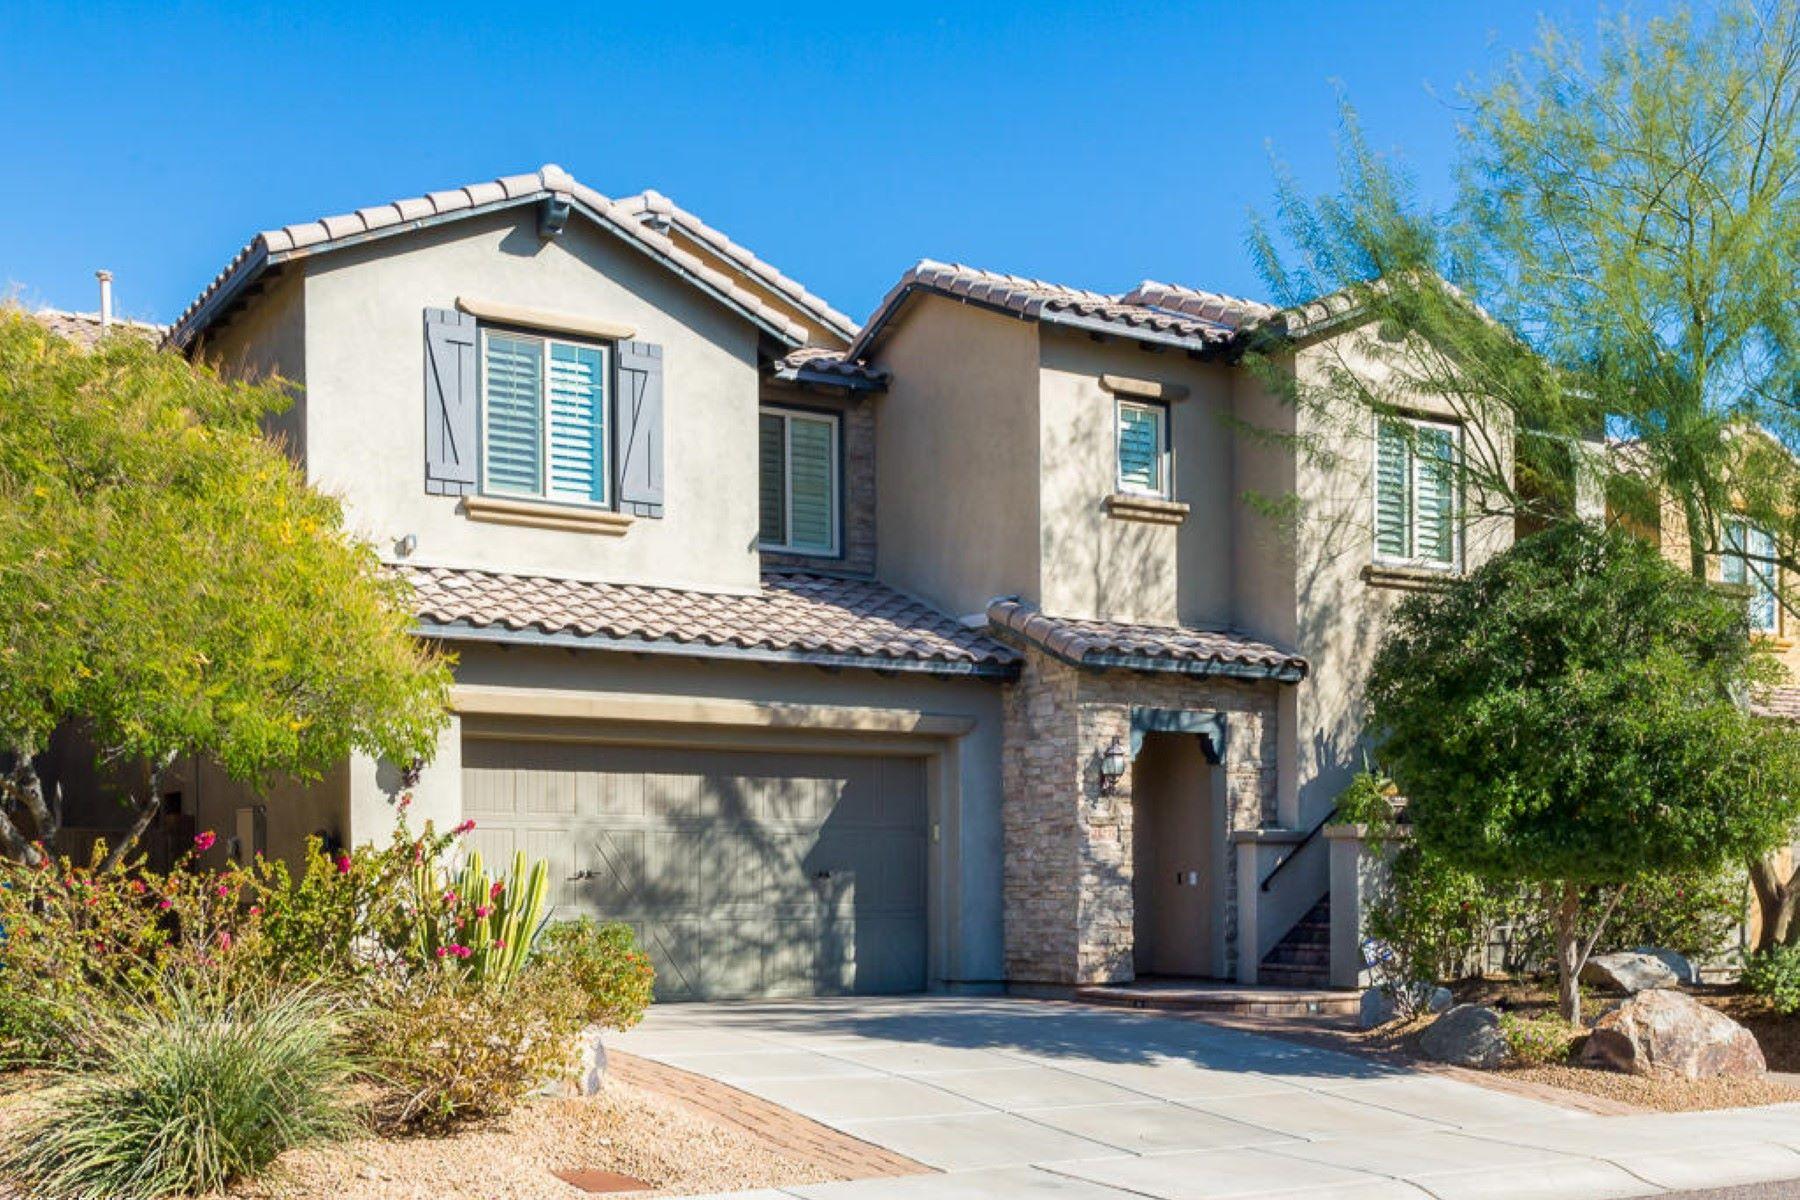 Casa Unifamiliar por un Venta en Beautiful home in the highly desirable Desert Ridge neighborhood of Fireside 21215 N 38th Pl Phoenix, Arizona, 85050 Estados Unidos